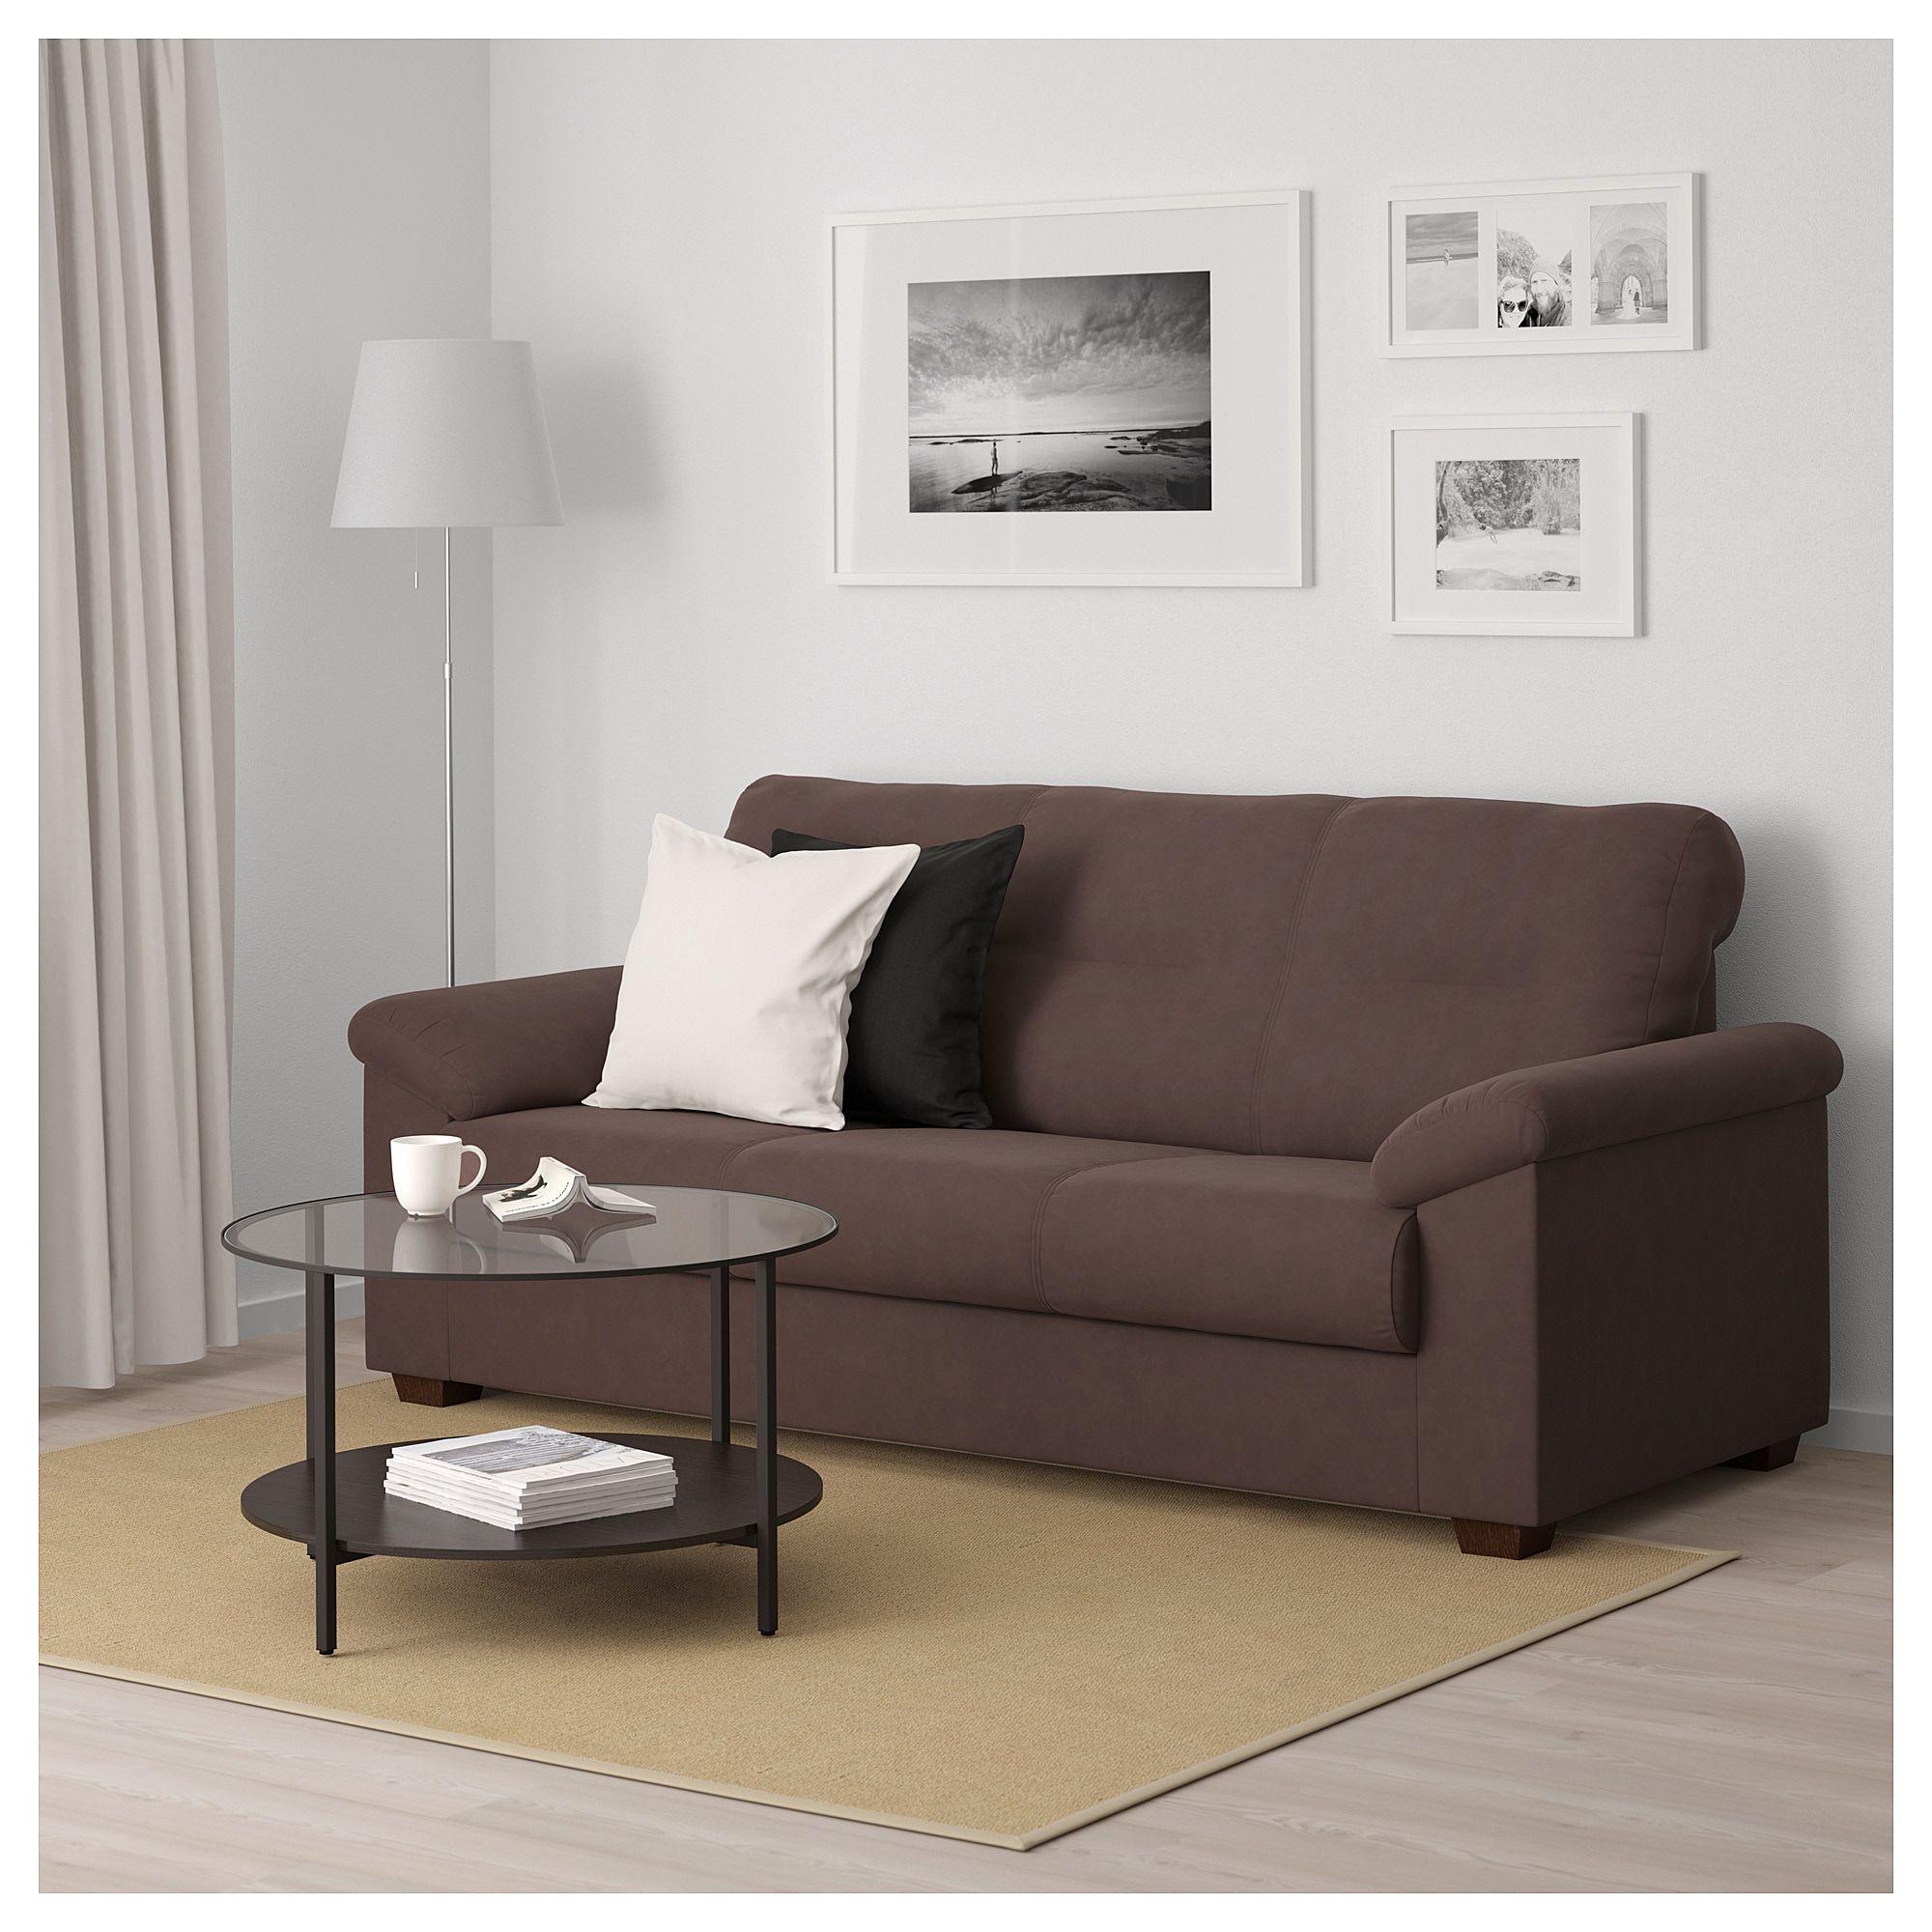 10 muebles imprescindibles para tu primer piso Ideas de